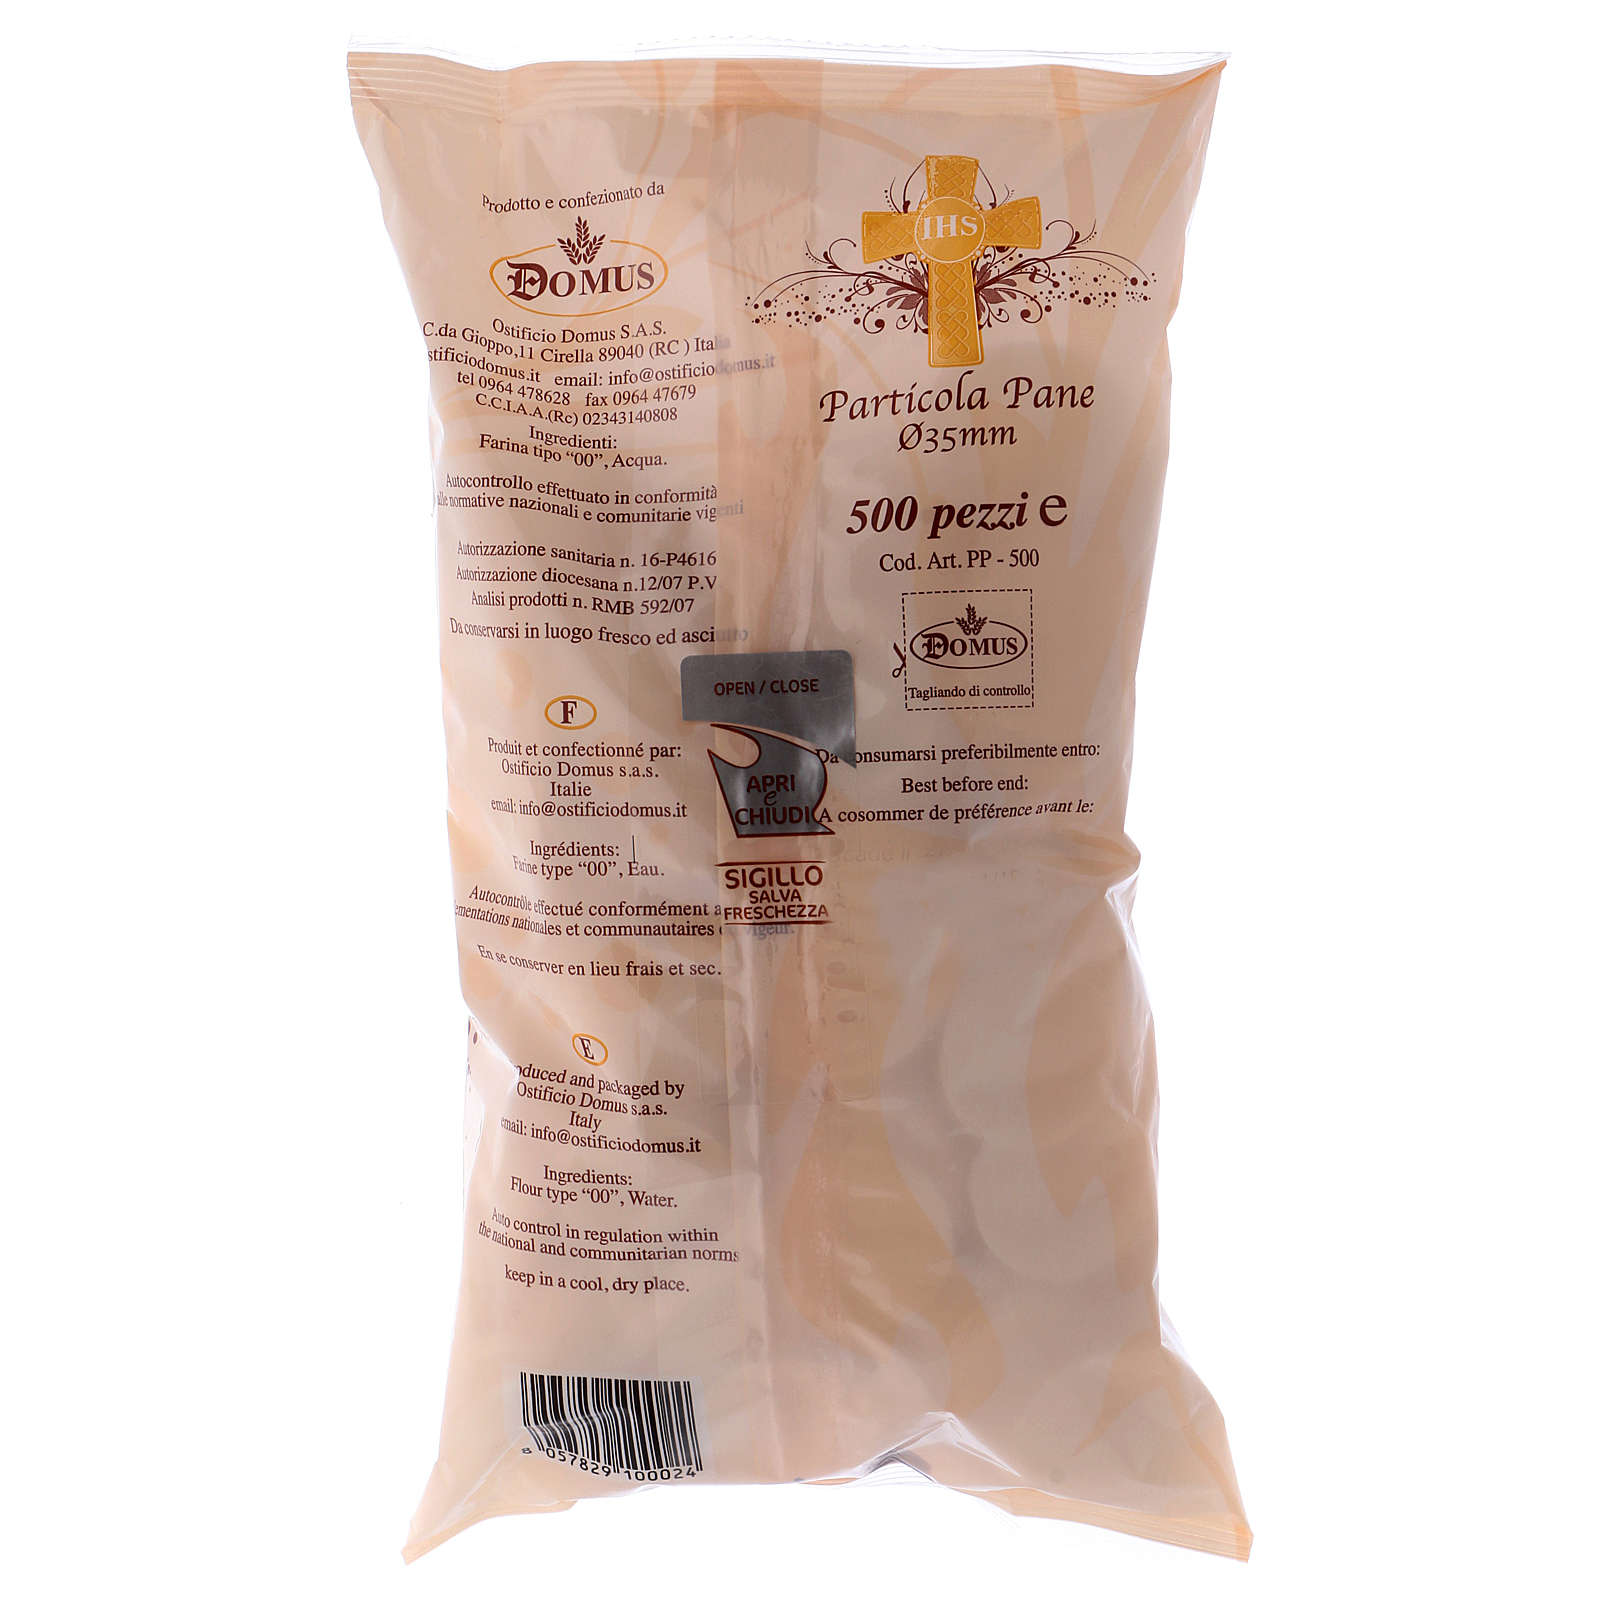 Hostia / Forma pan espesor 1.4 mm 500 piezas diámetro 3.5 3